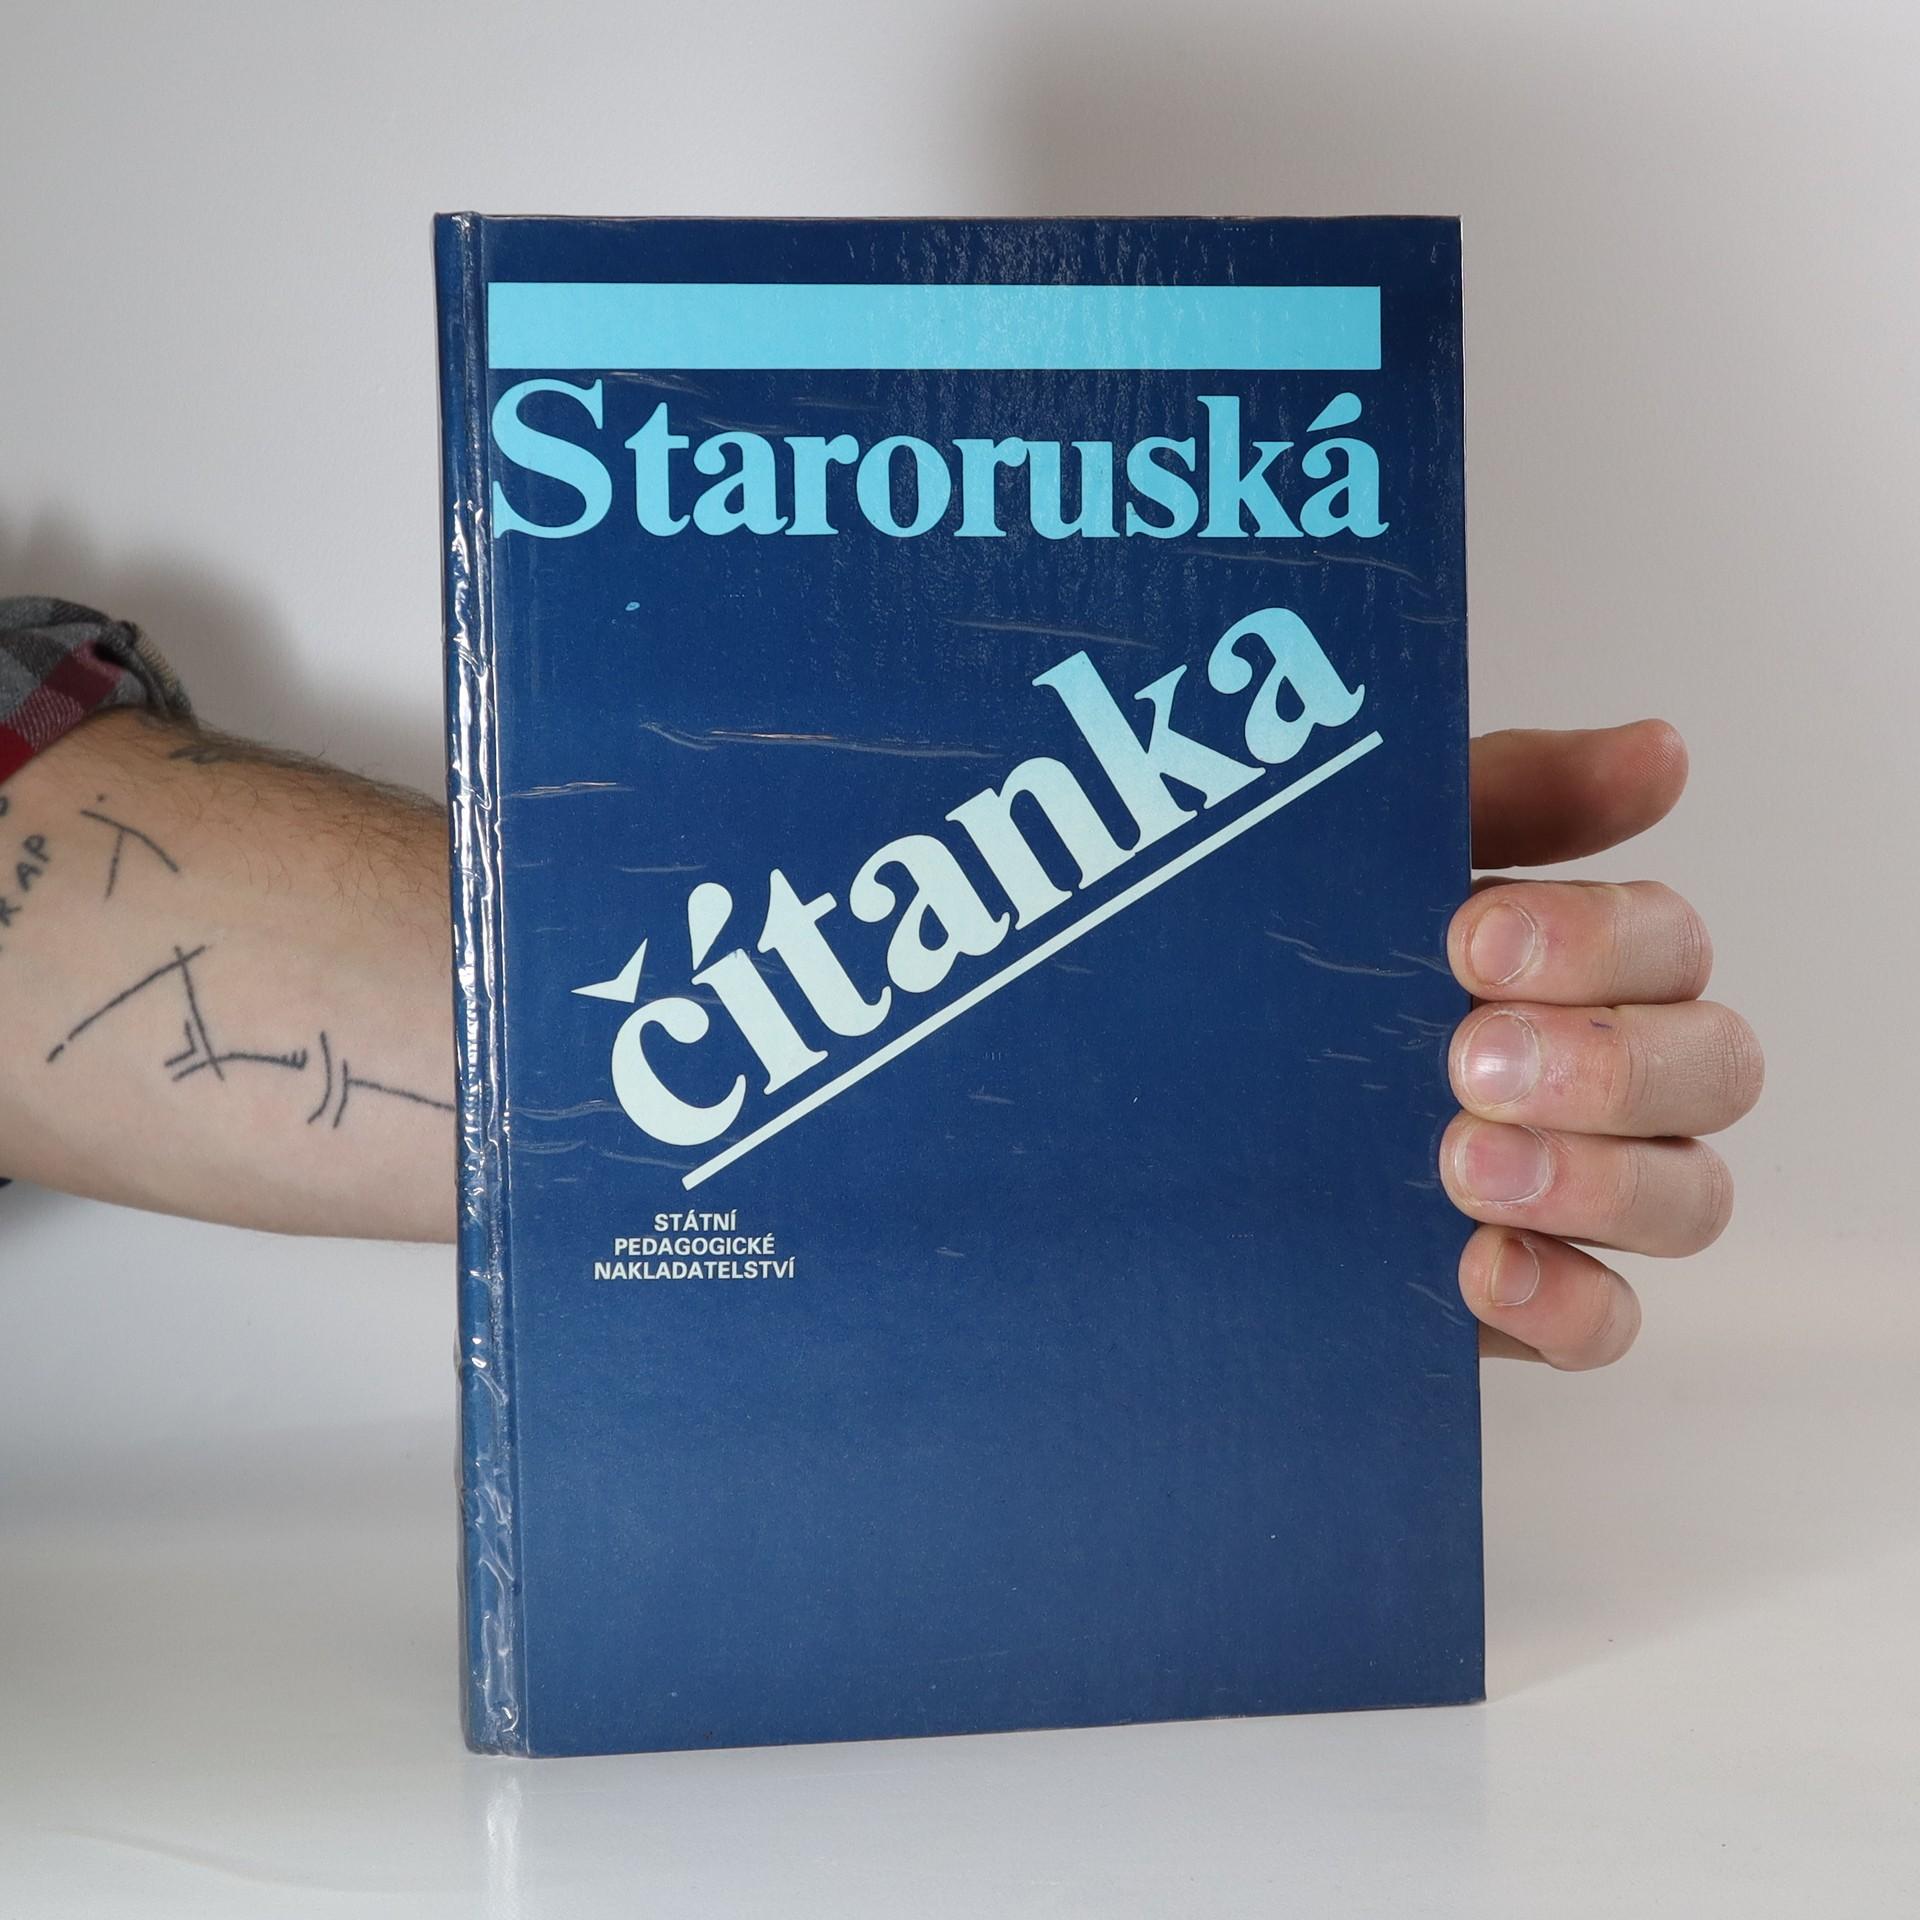 antikvární kniha Staroruská čítanka, 1989